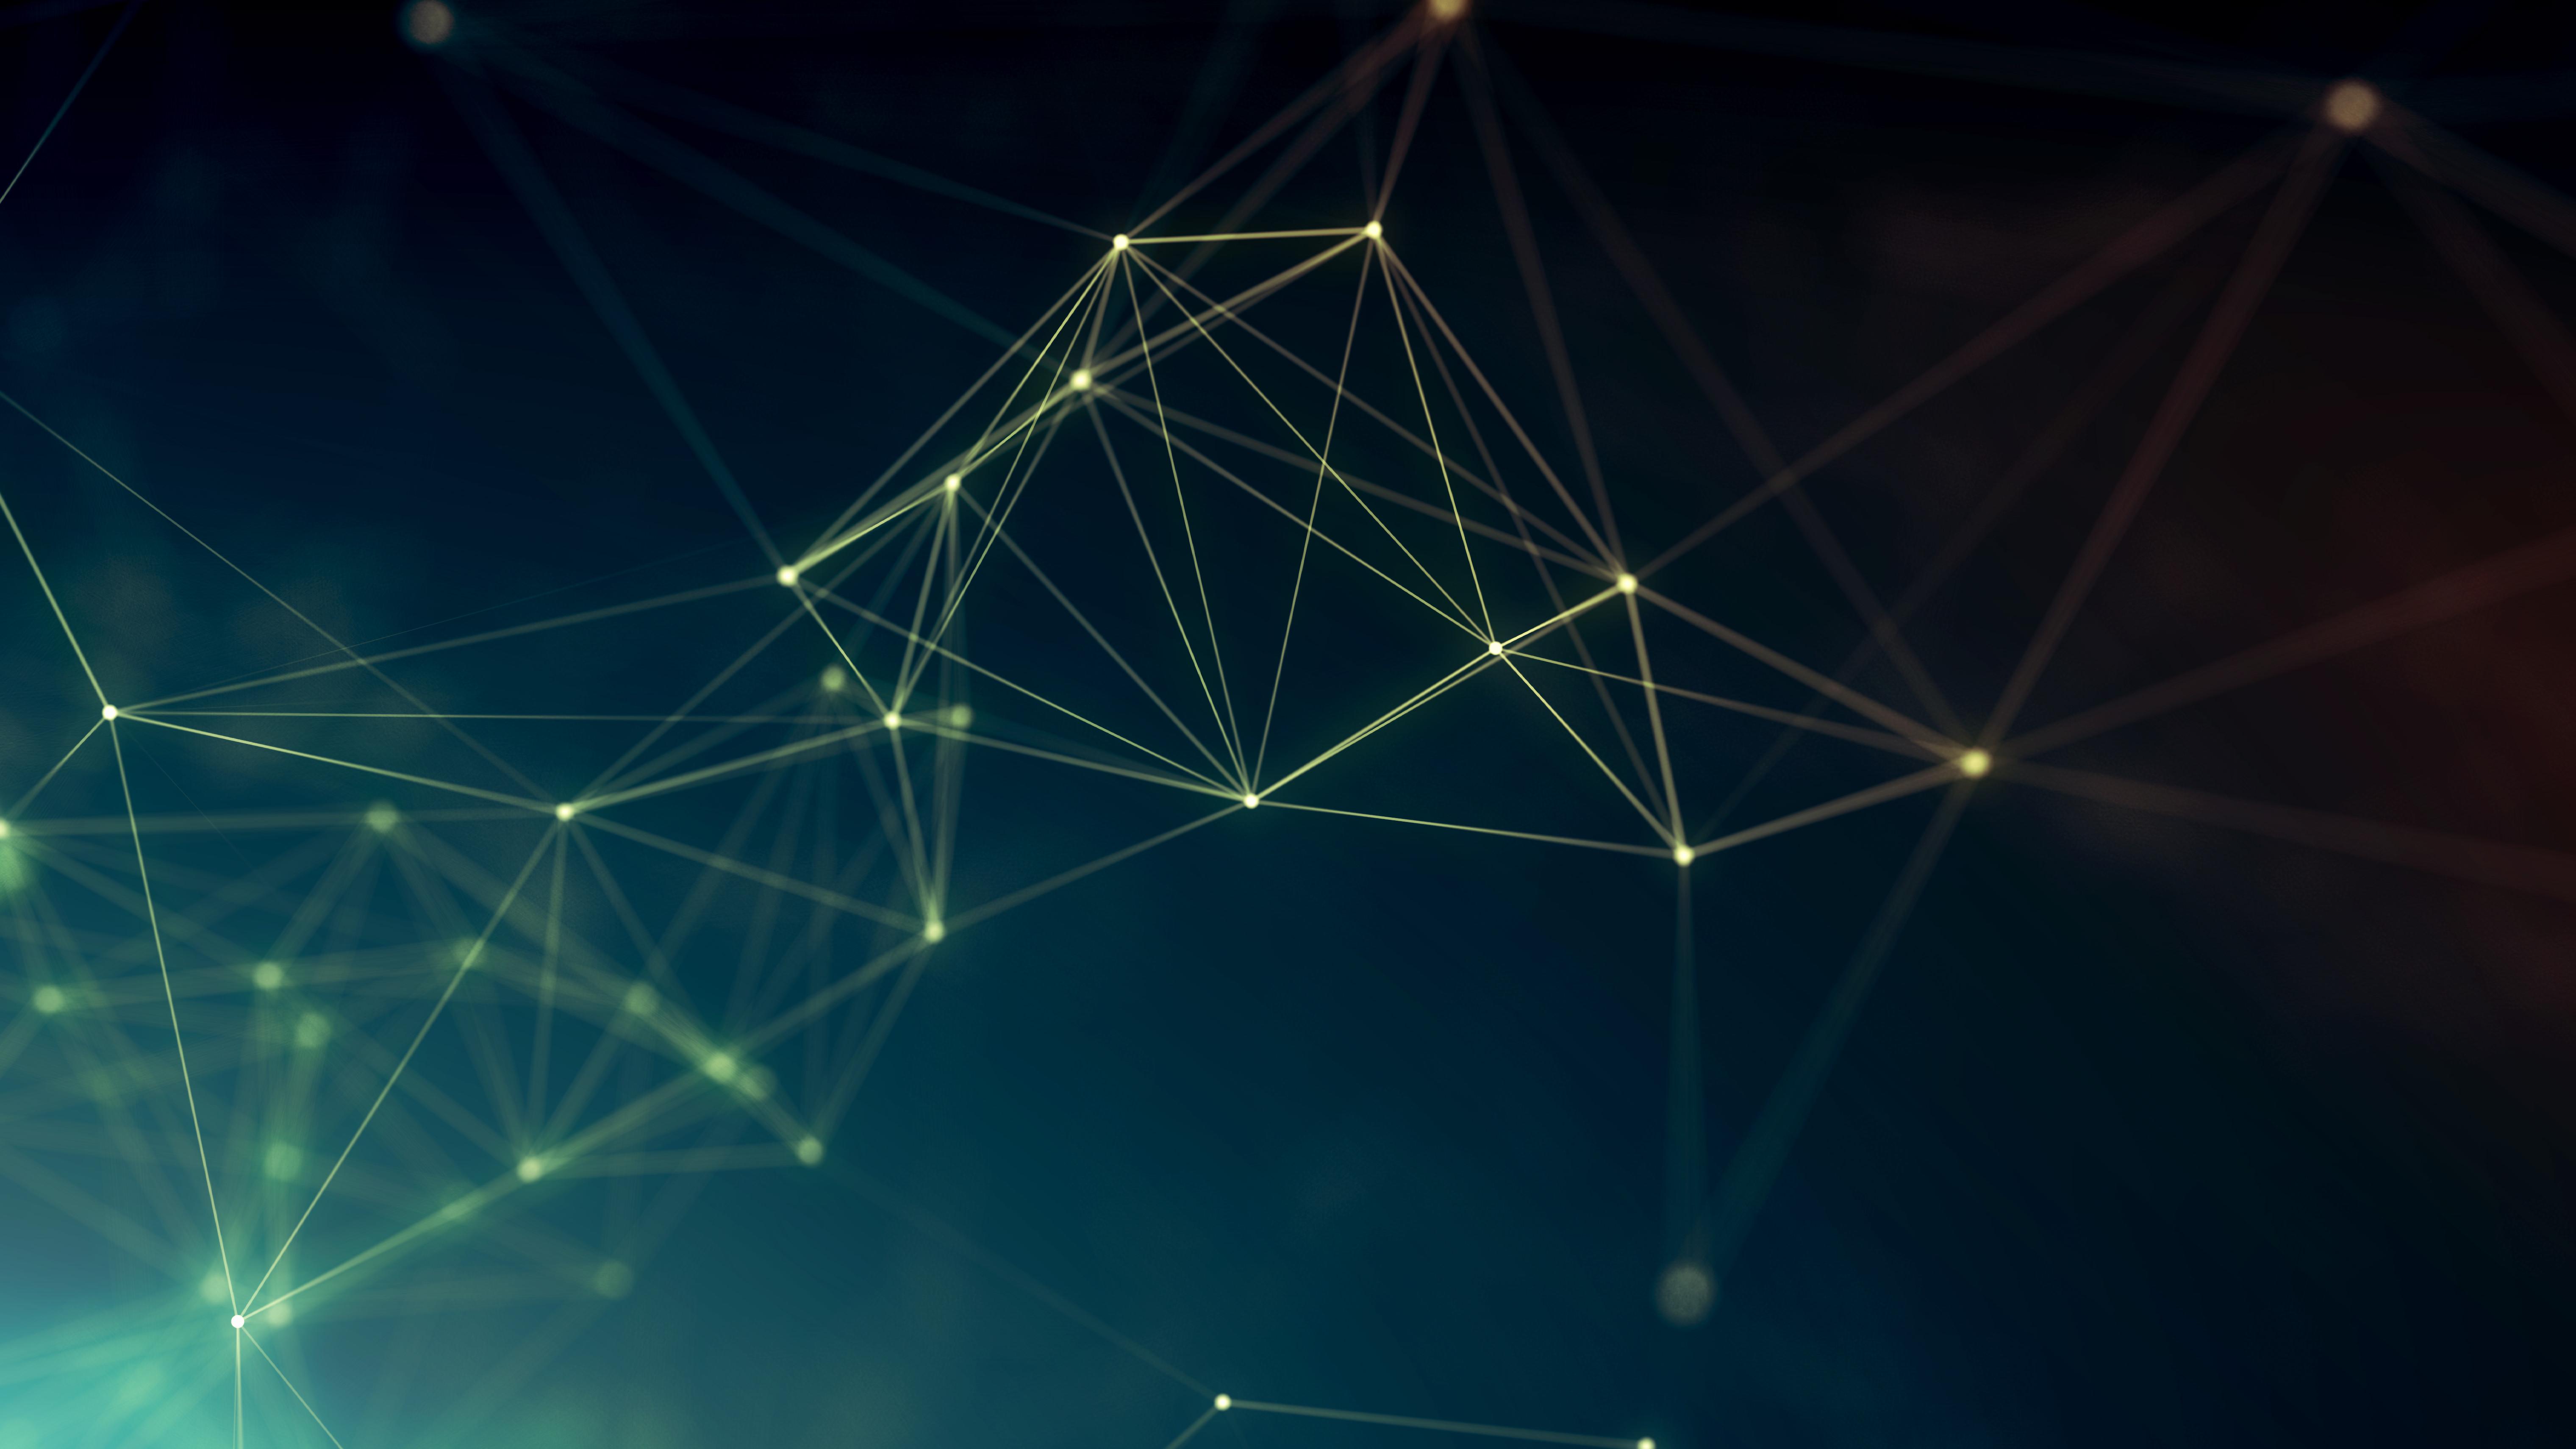 General 6080x3420 geometry cyberspace abstract digital art lines